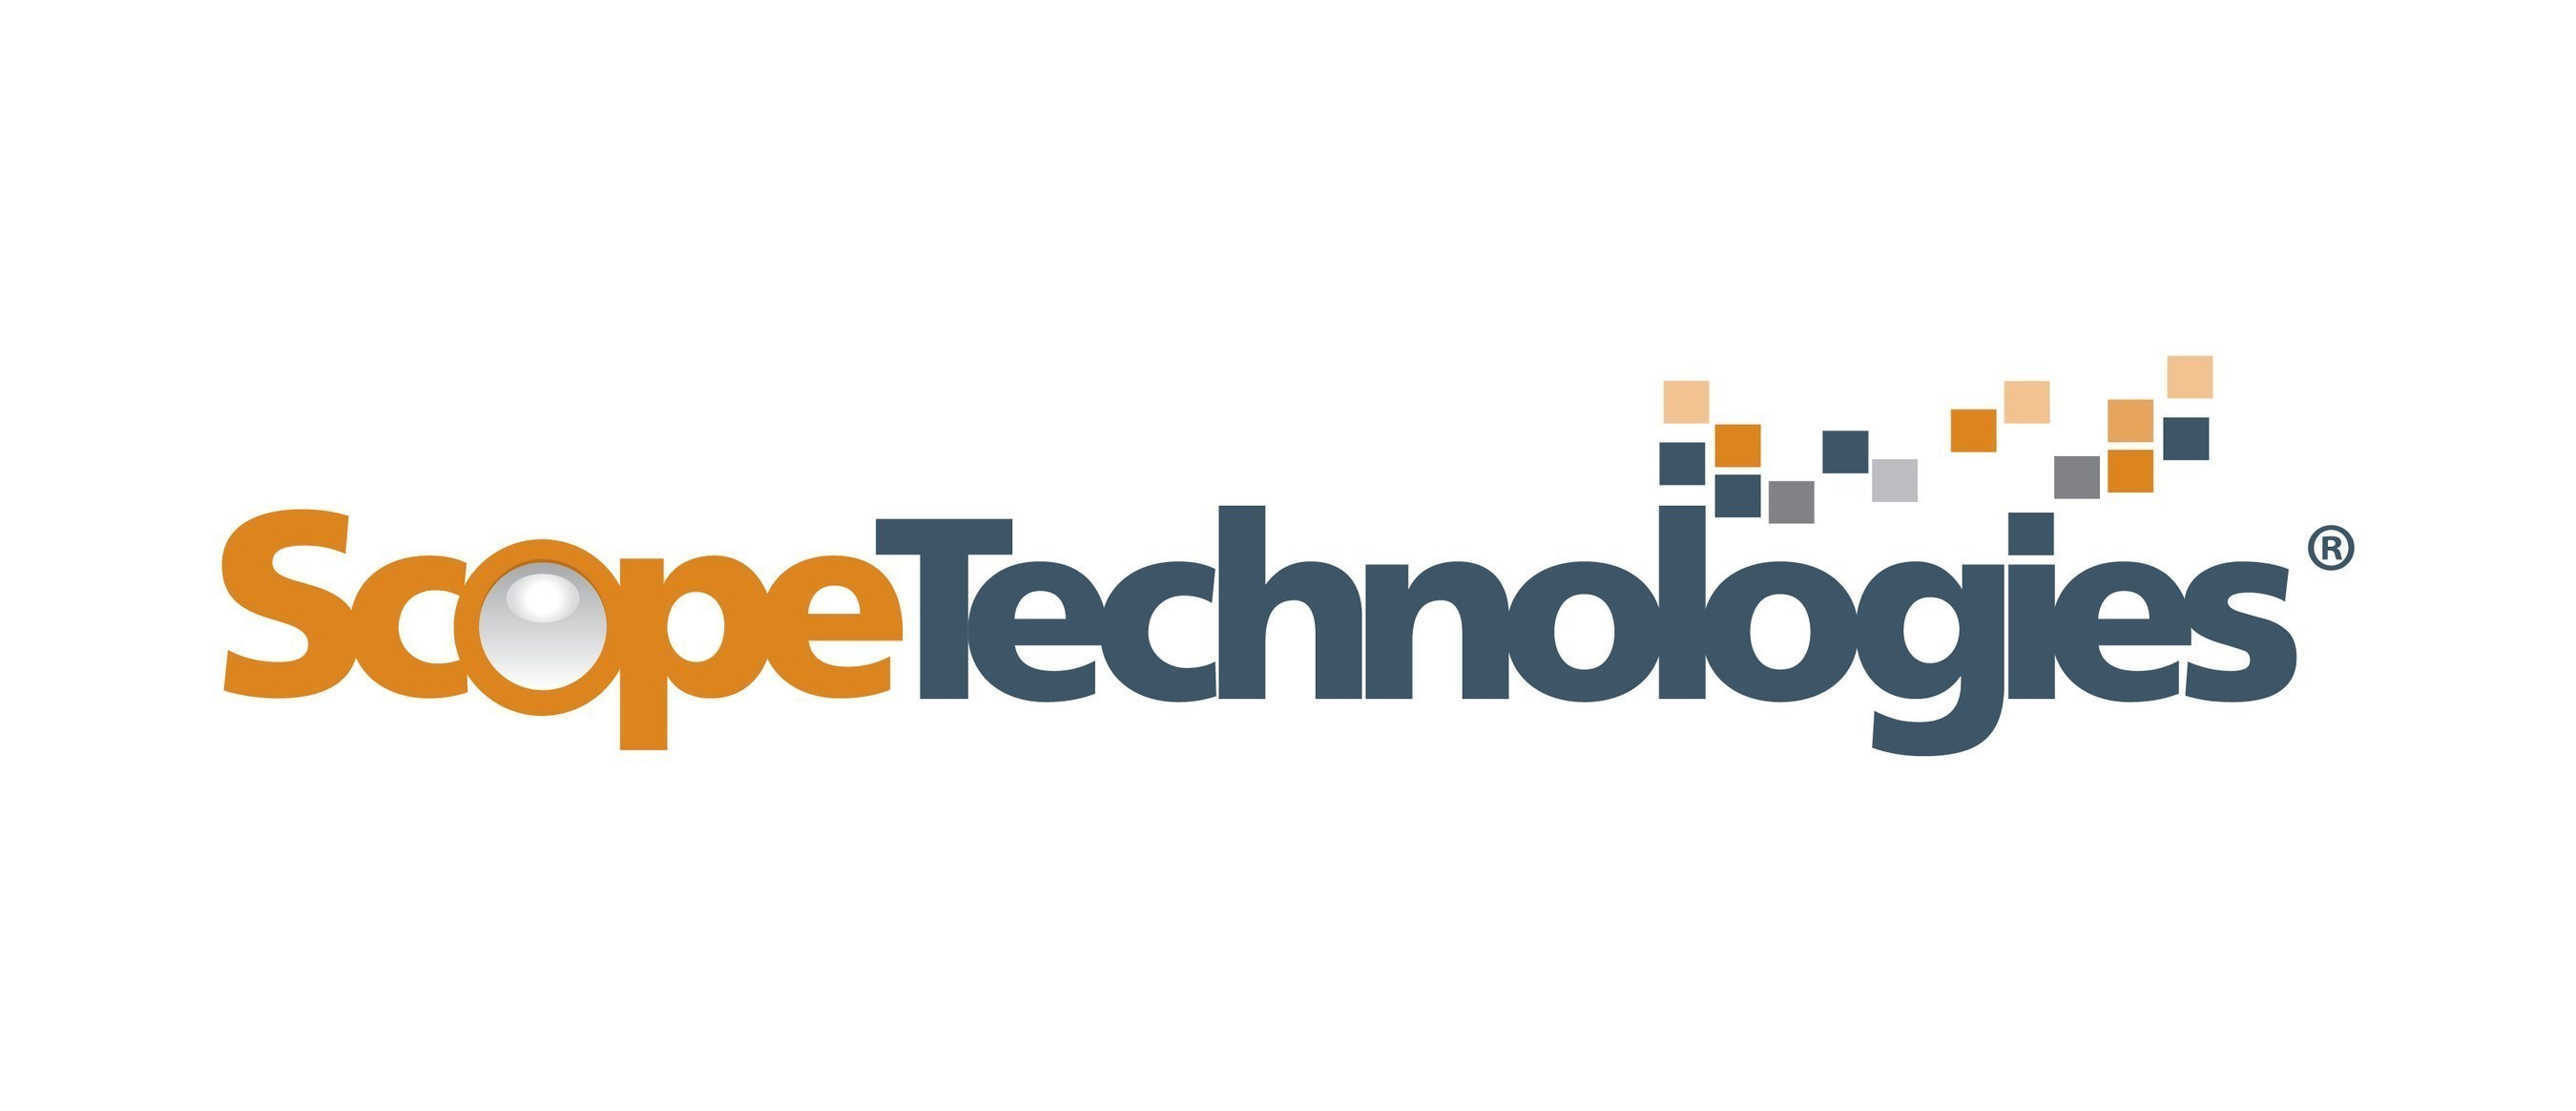 Scope Technologies® Delivers A Robust Estimating Work Management